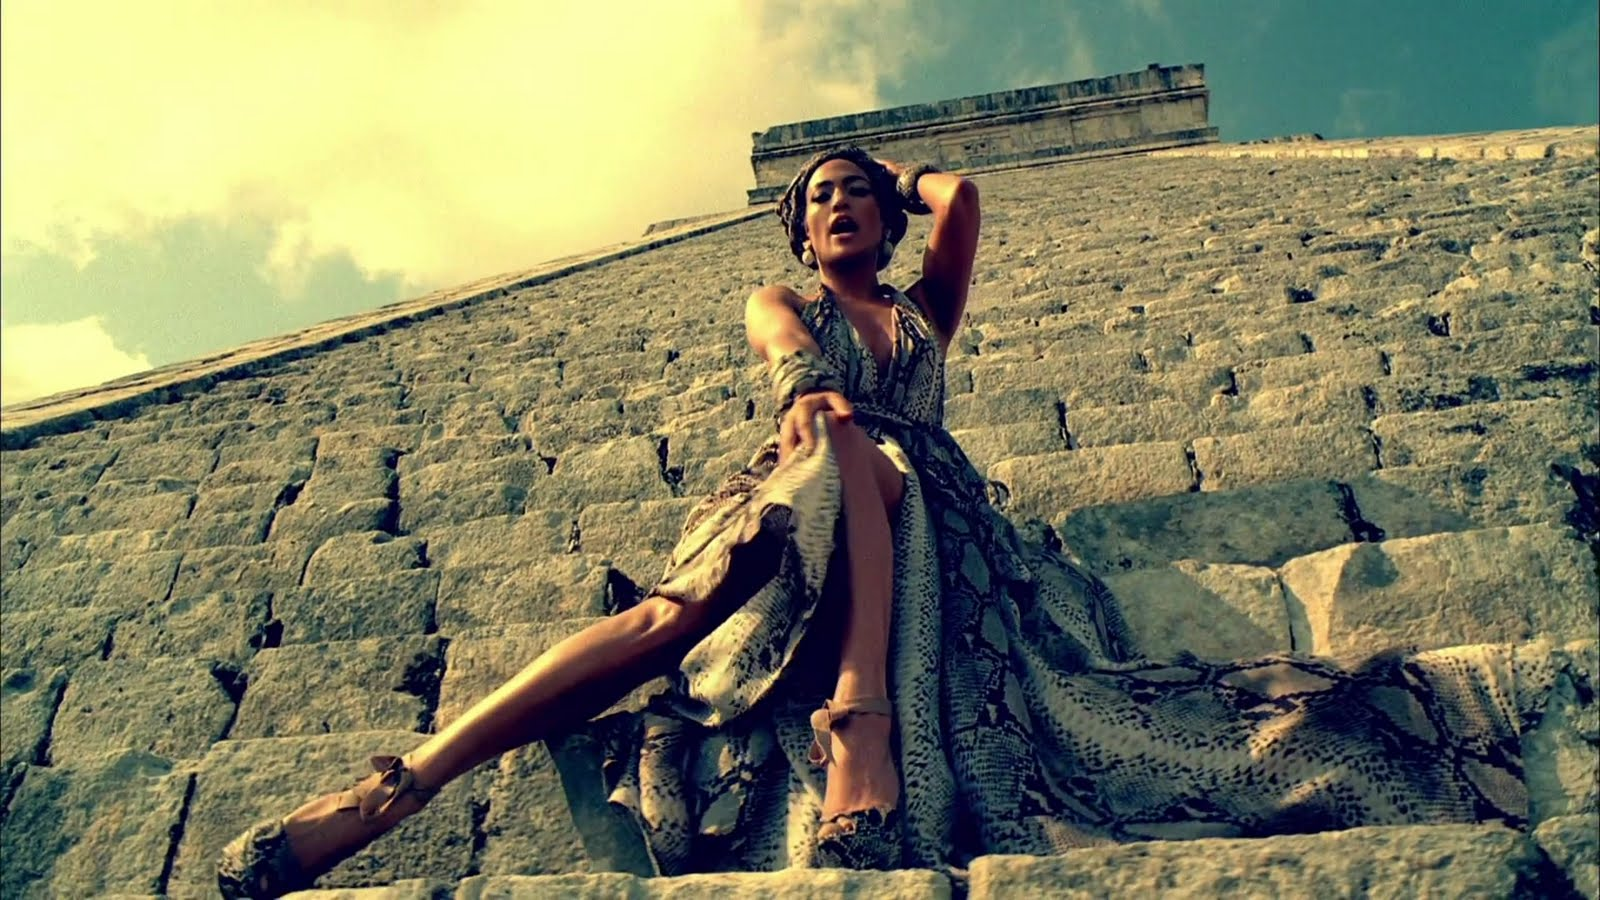 http://3.bp.blogspot.com/-_H4iSdK8Teg/Td1kX3wgqzI/AAAAAAAAAHE/Zyjs6MID4yk/s1600/Jennifer+Lopez+-+I_m+Into+You+ft.+Lil+Wayne-mero.mp4_snapshot_04.00_%255B2011.05.04_22.06.24%255D.jpg